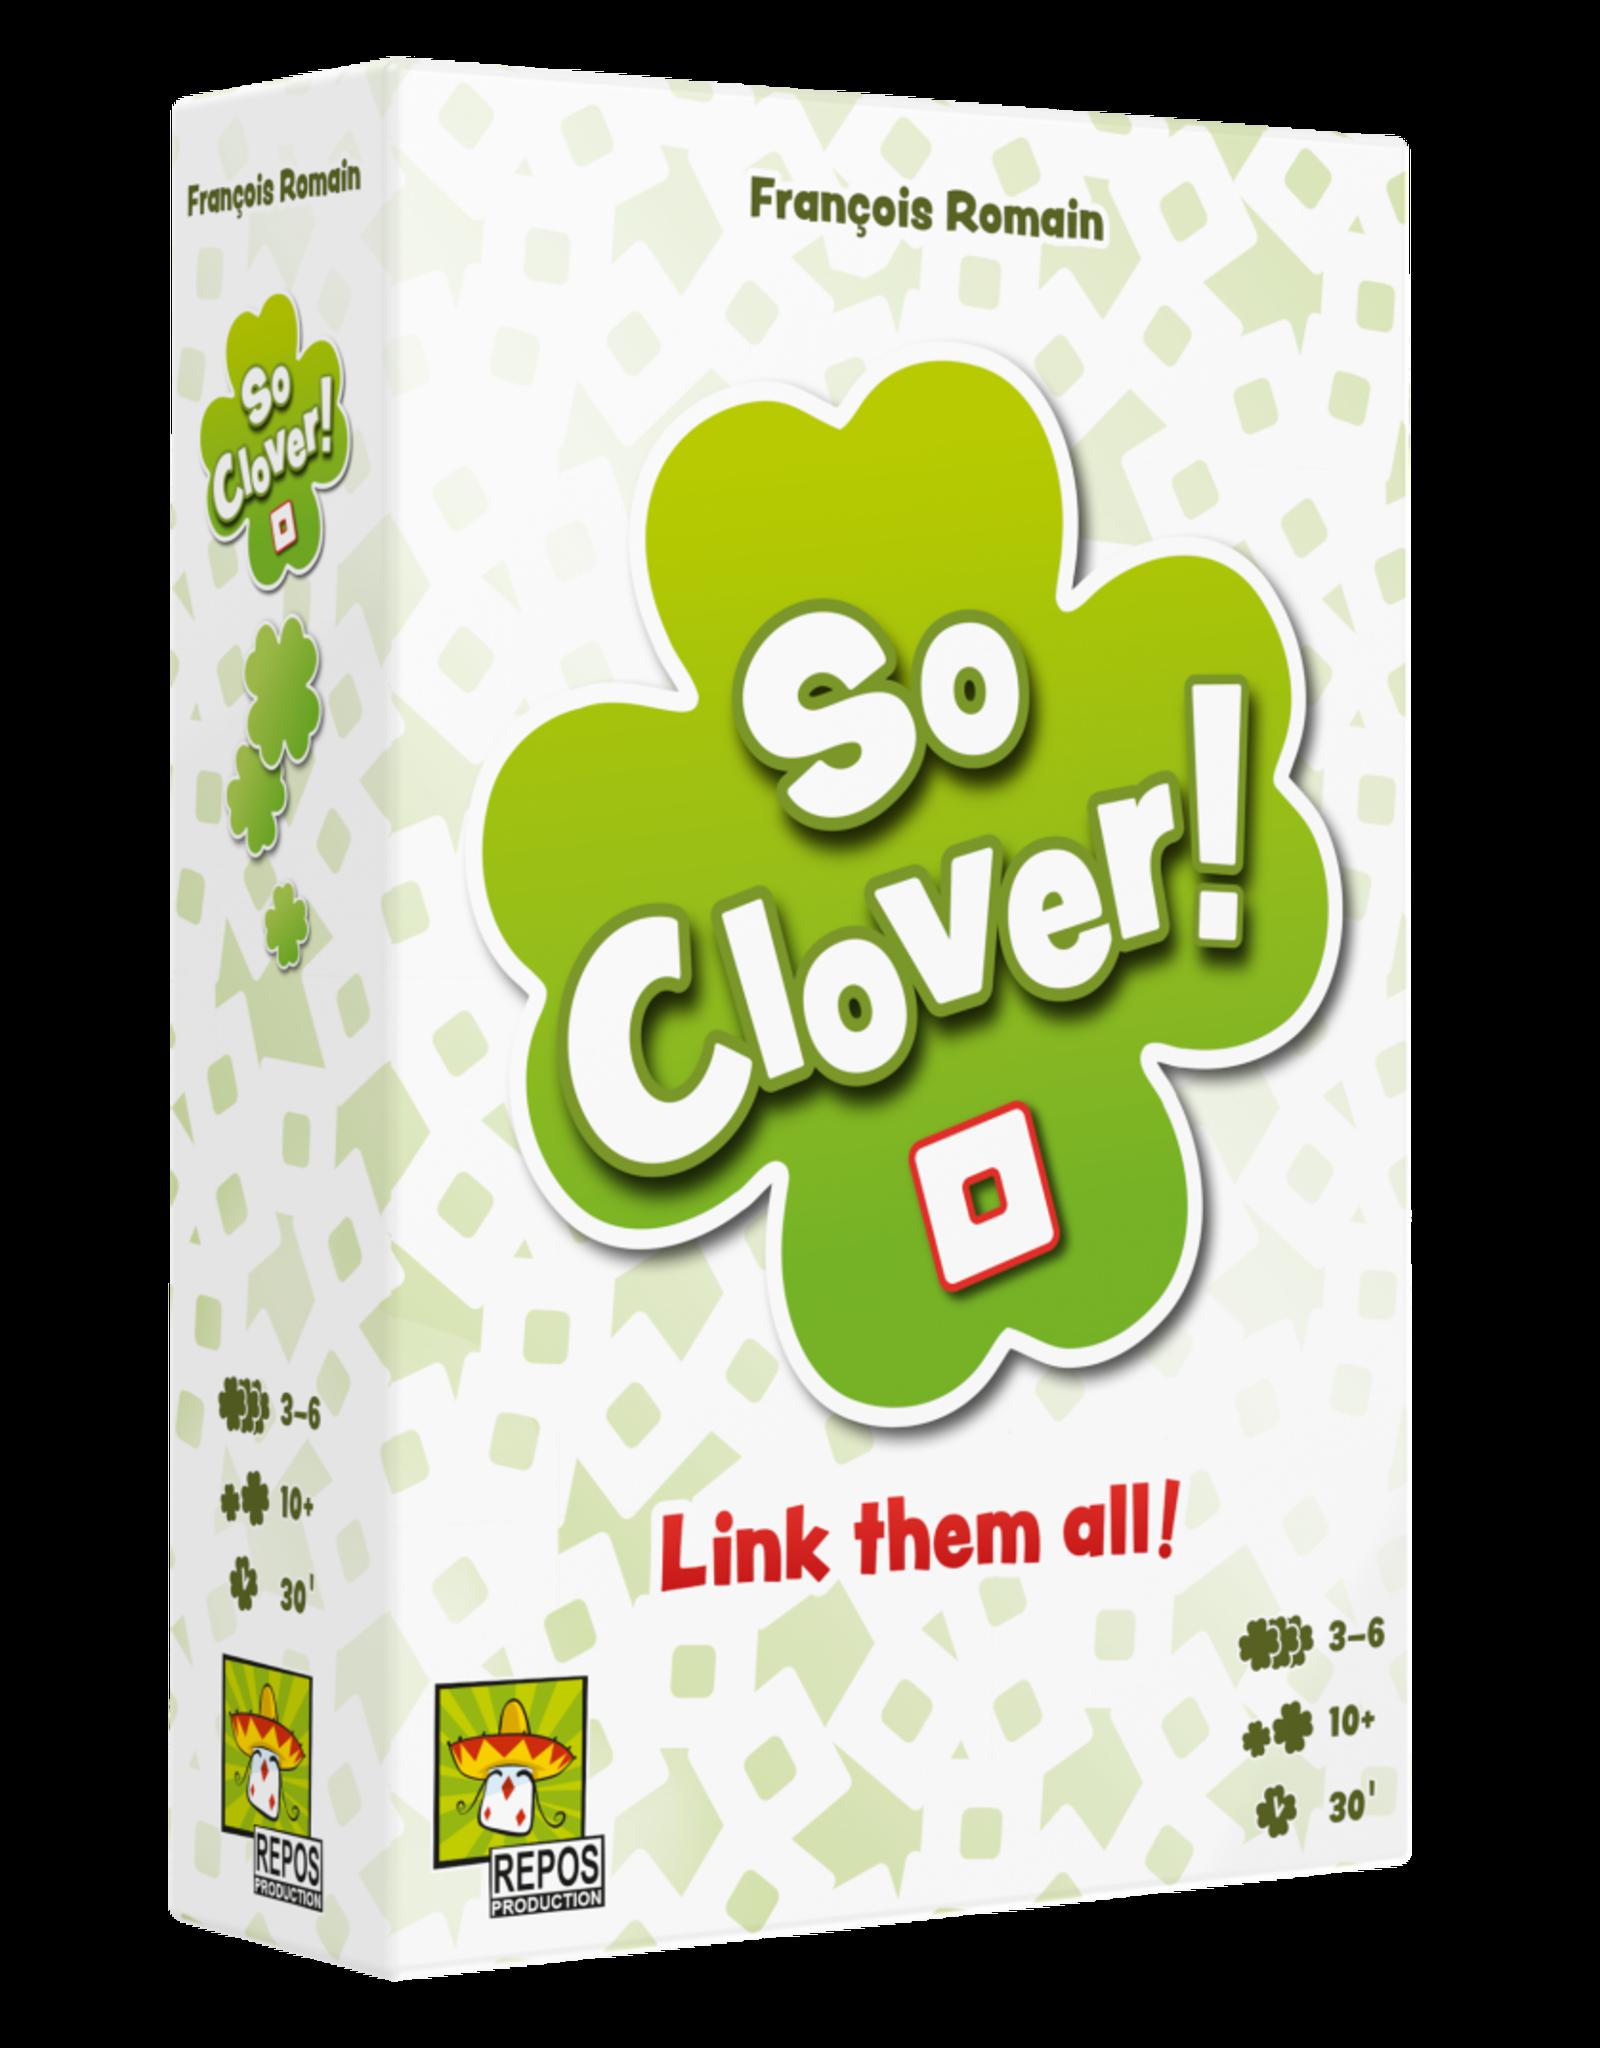 Repos So Clover!